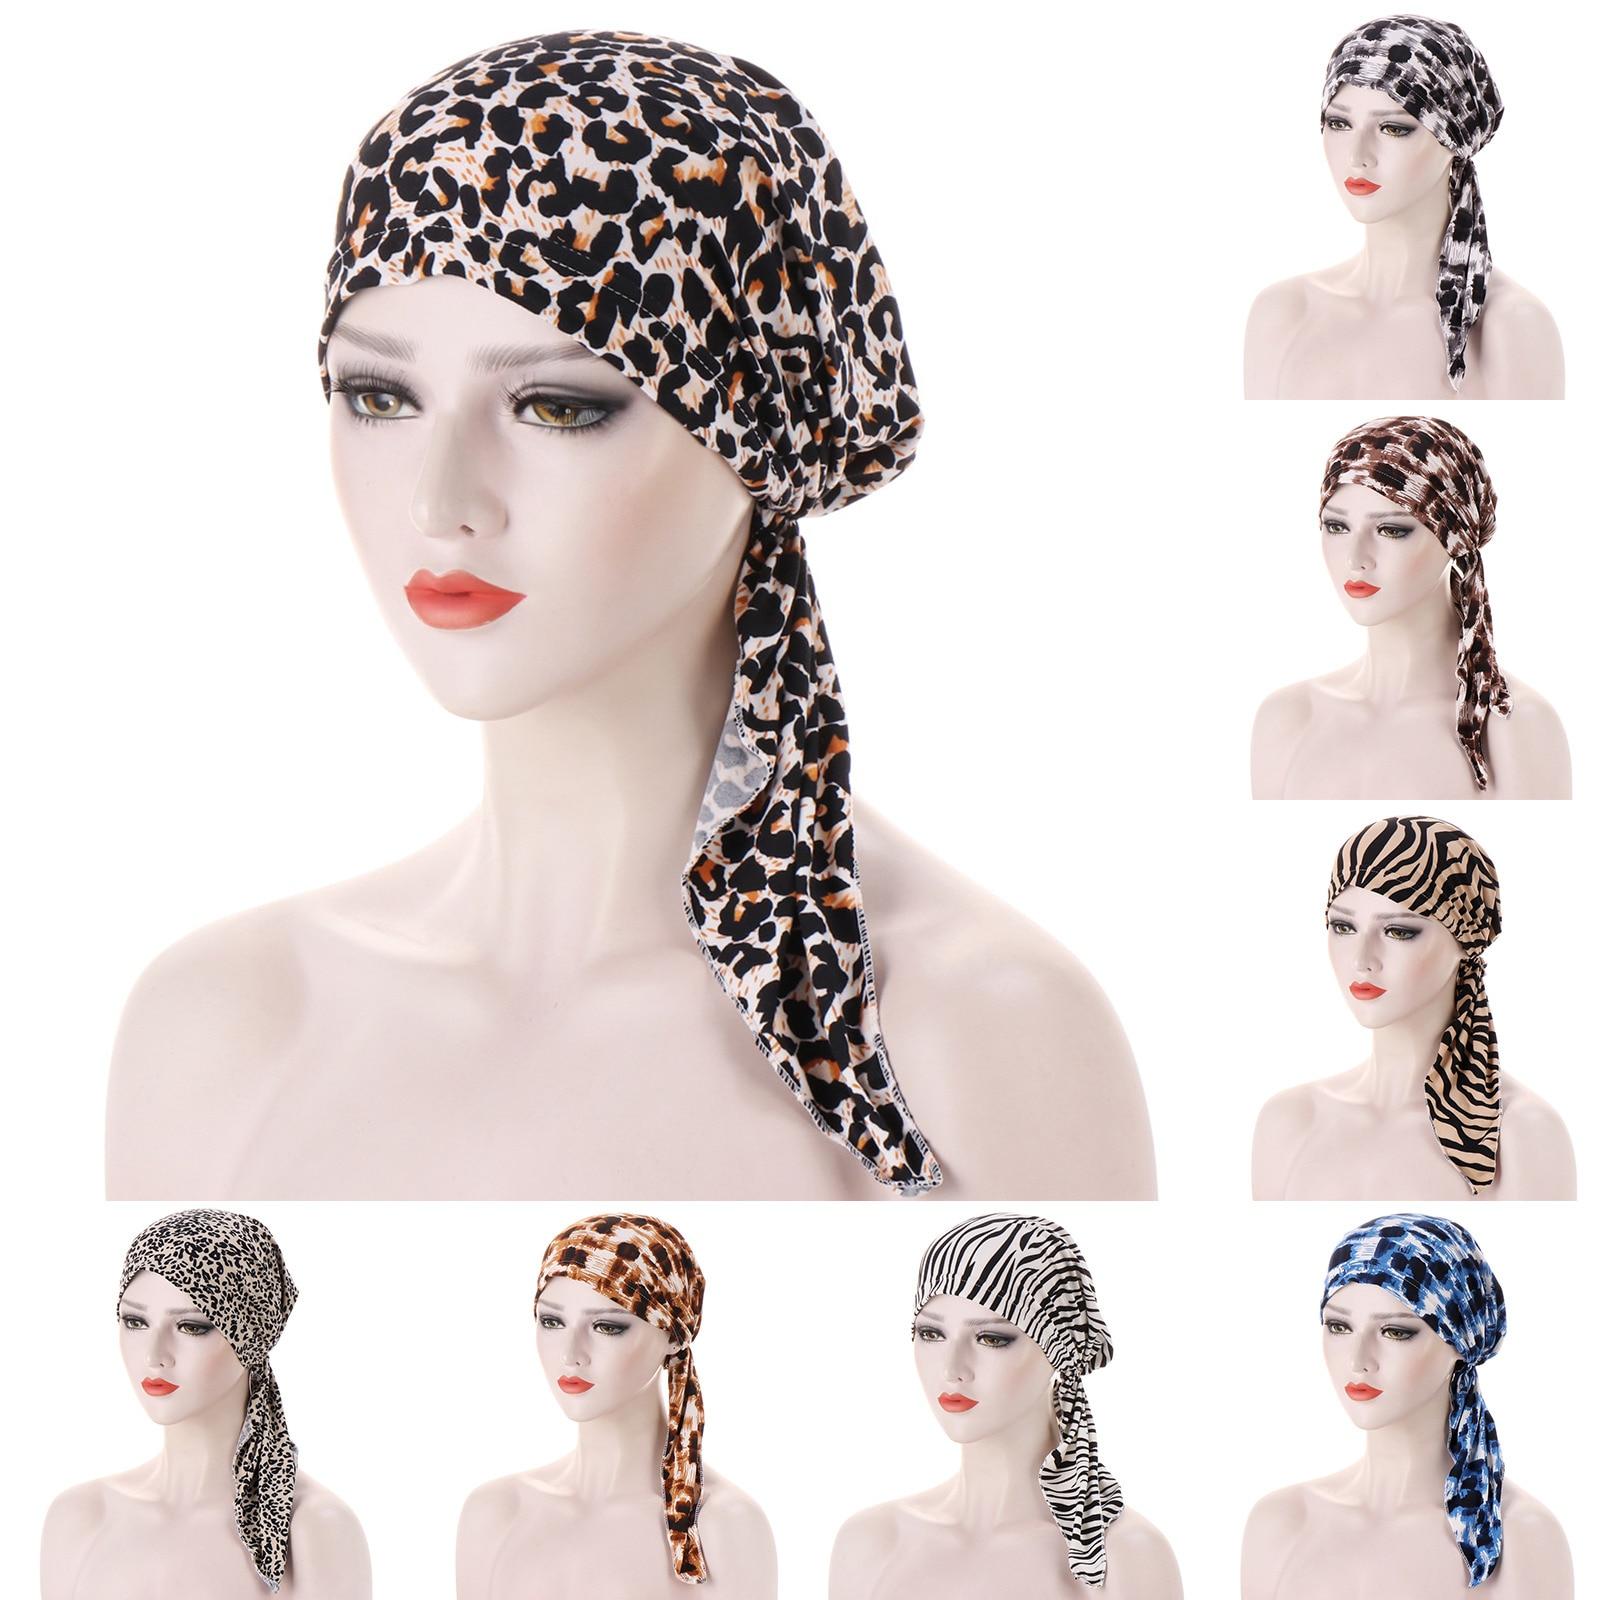 Women Fashion Hijab Cancer Chemo Muslim Leopard Print Hat Turban High-quality Head Cover Hair Loss Scarf Wrap Pre-tied Bandana